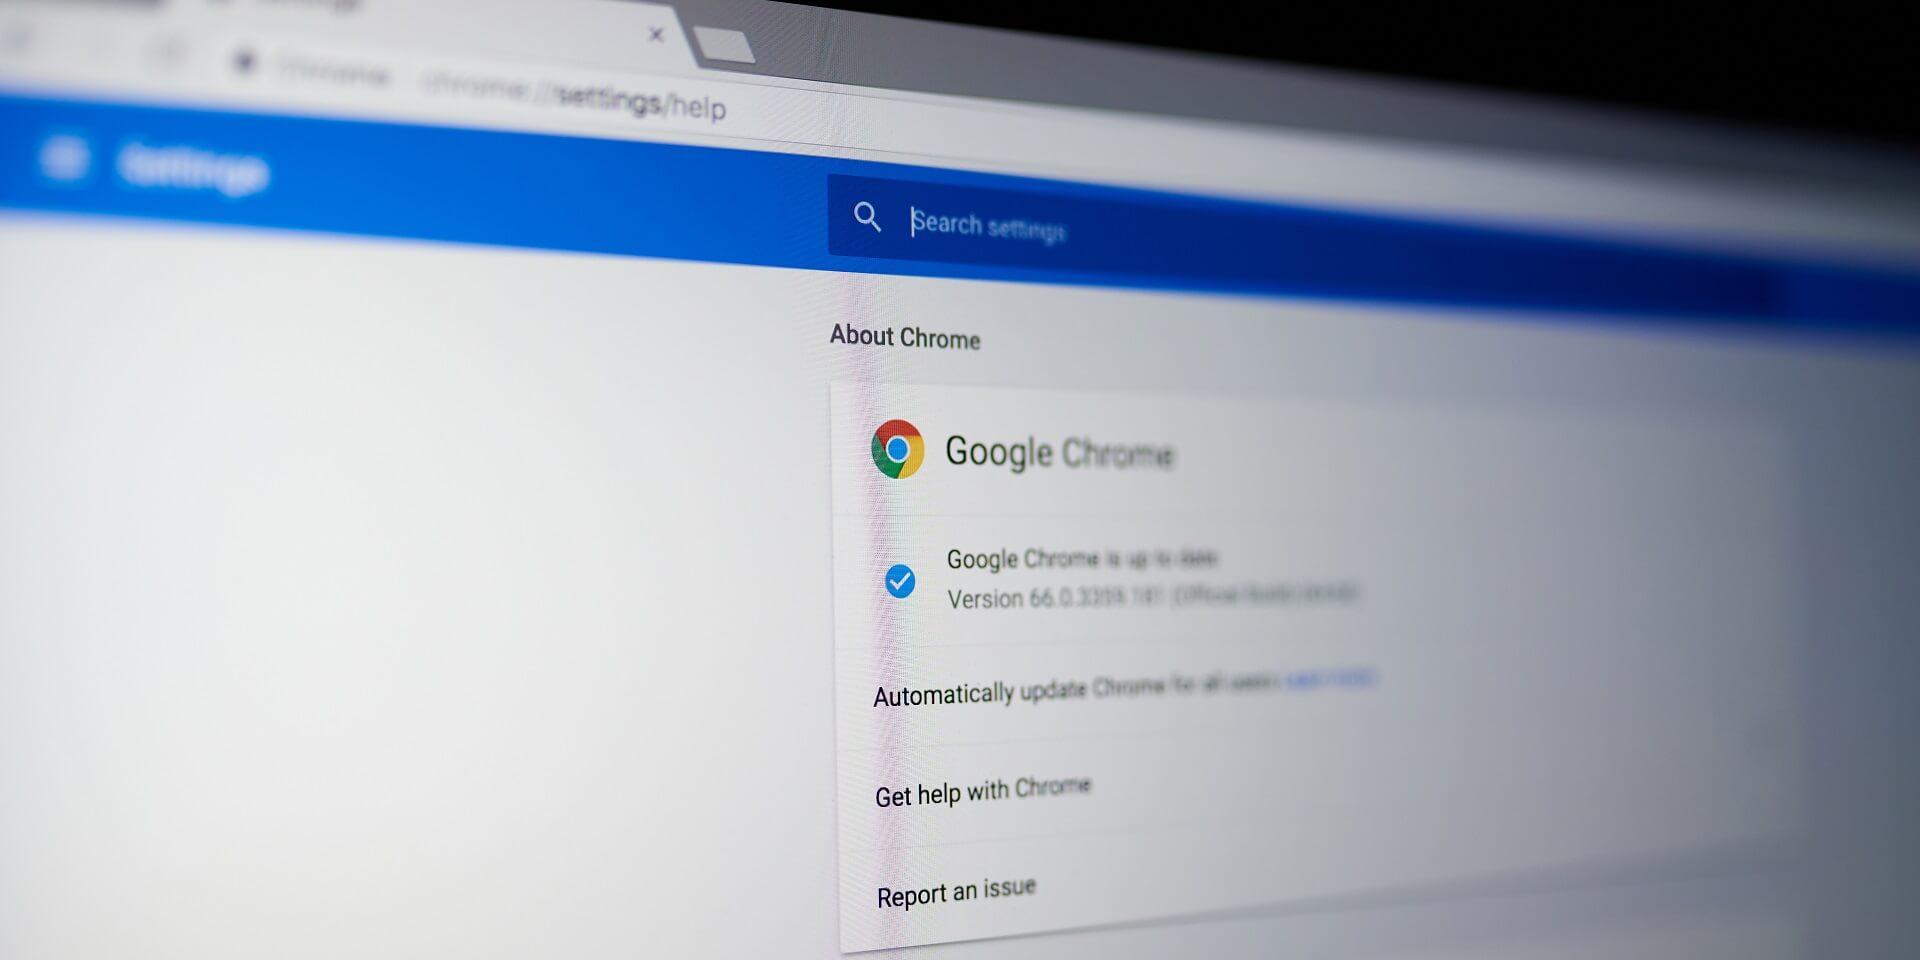 Digital Marketing Firms Hate Google's Anti-Cookie Initiative